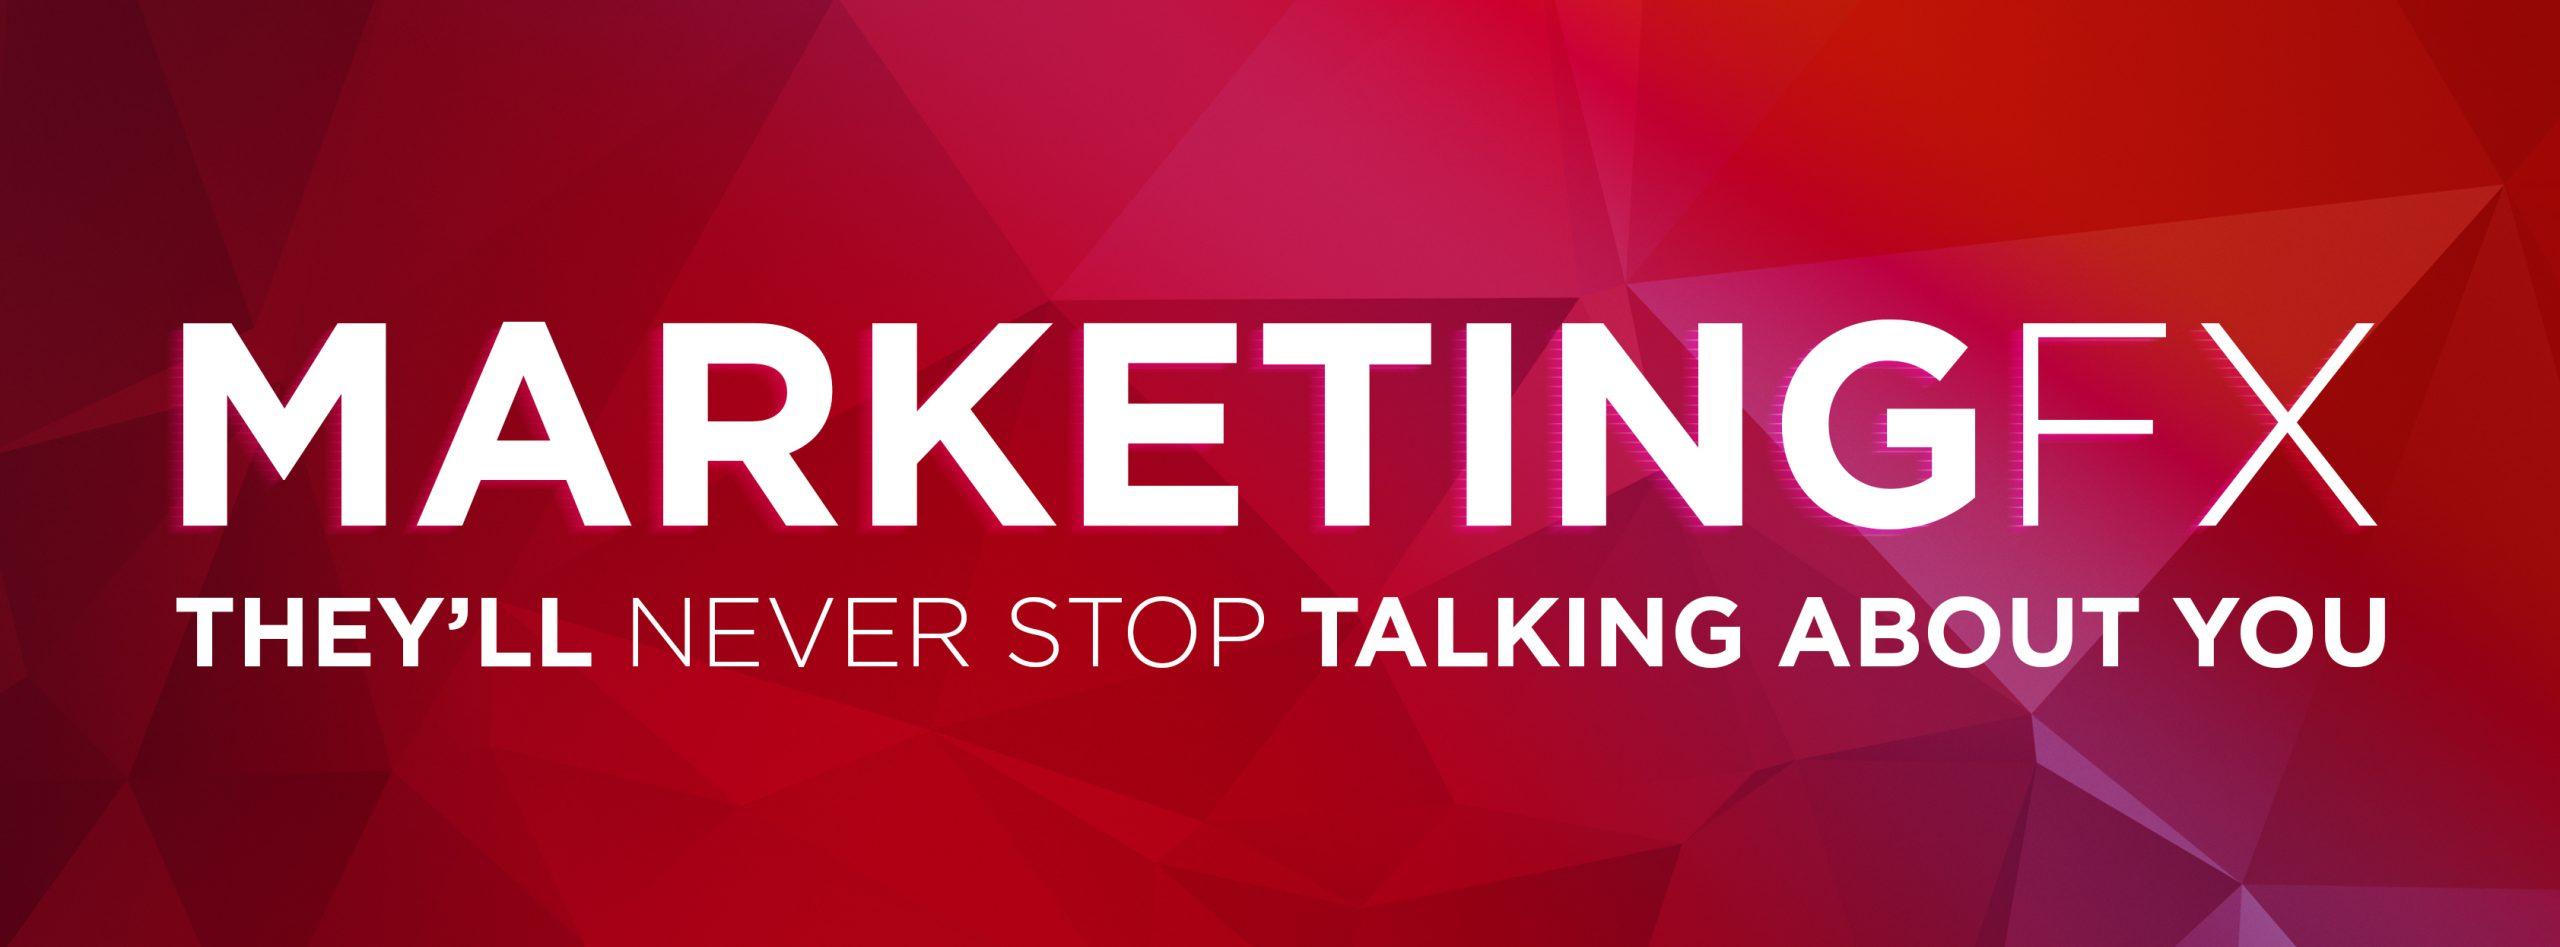 Agency MarketingFX Concept